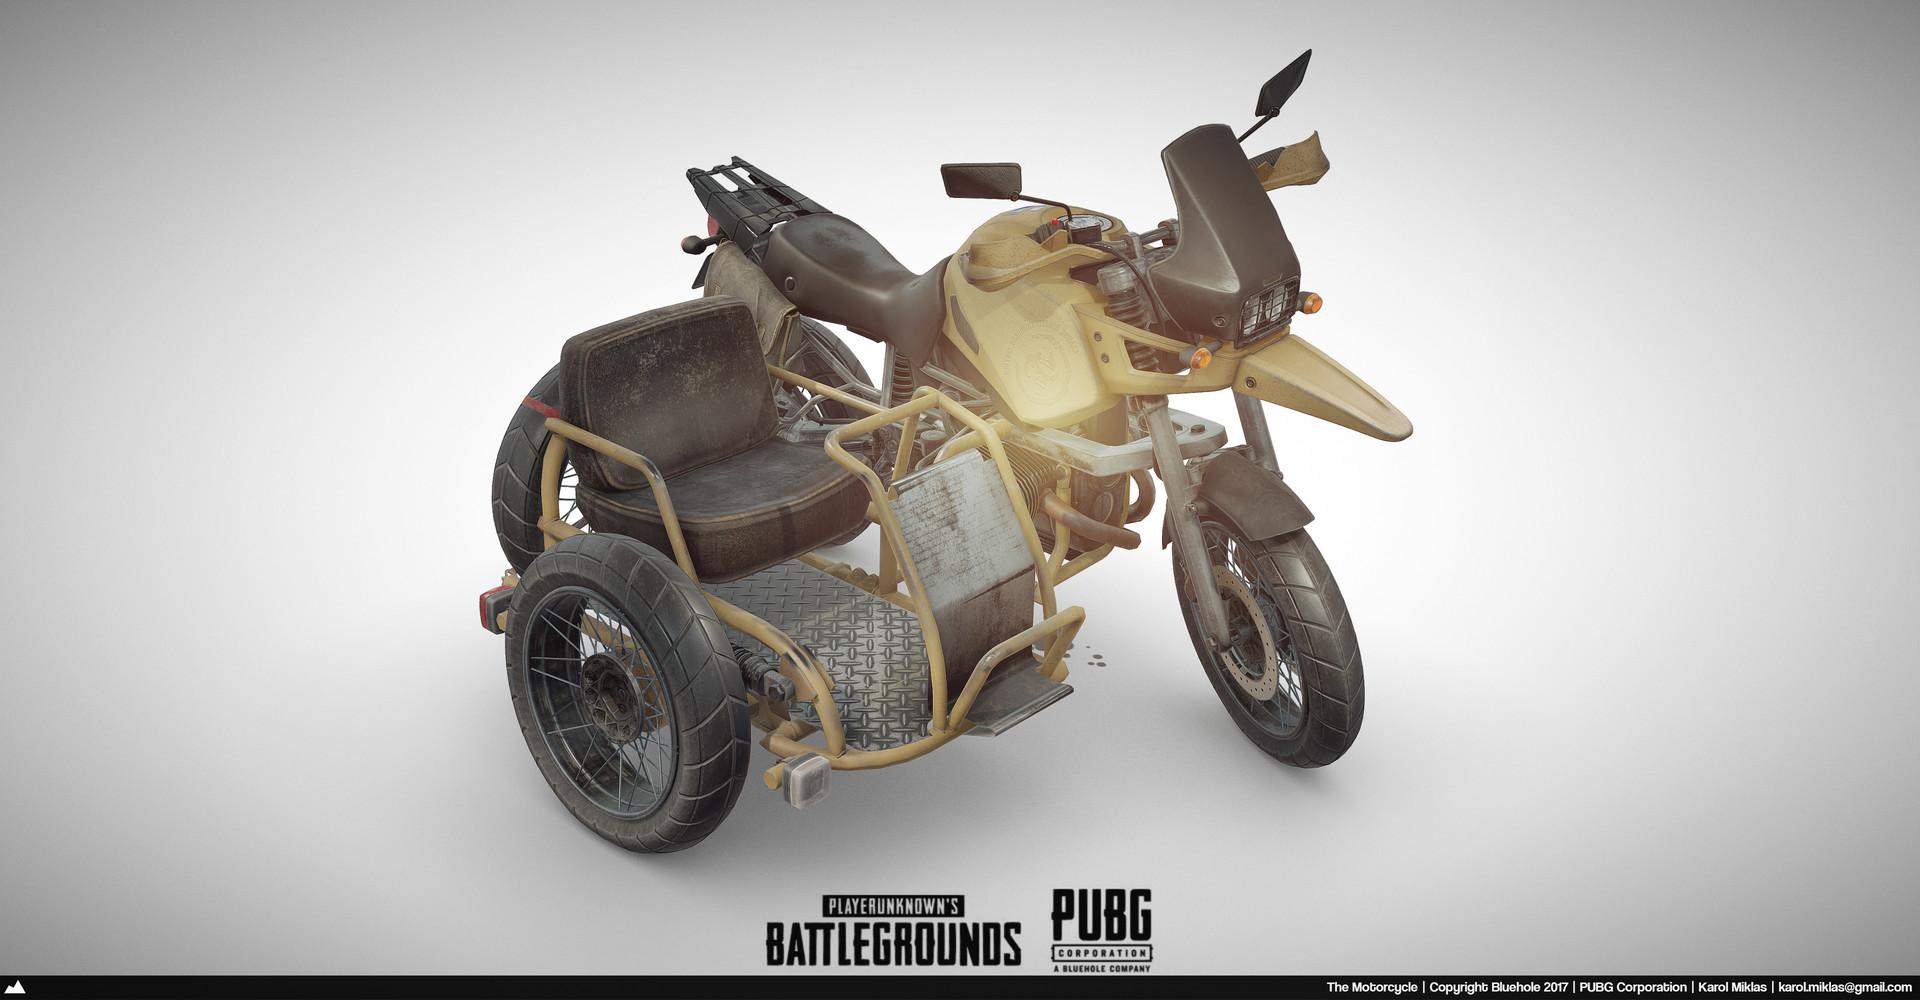 Pubg Buggy Wallpaper: Playerunknown's Battlegrounds: Motorcycle